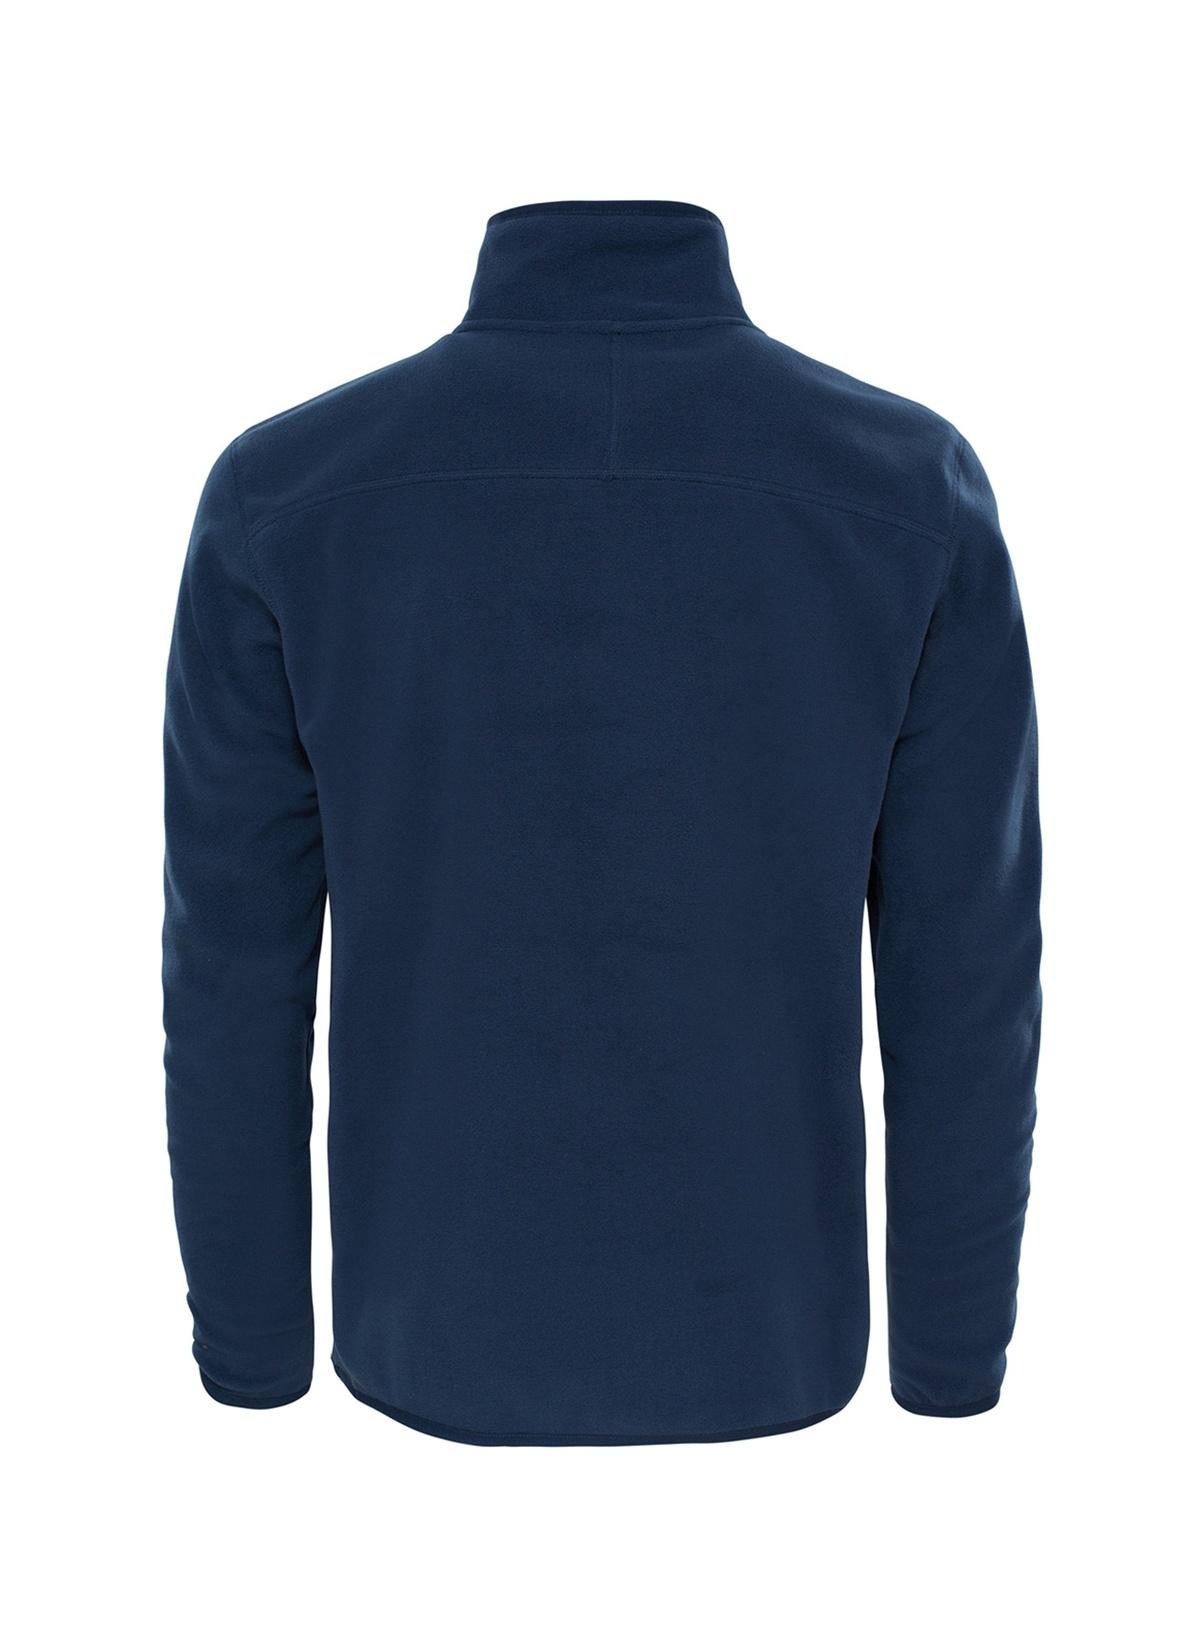 The North Face Sweatshirt T92uaru6r The North Face Polar S – 385.0 TL